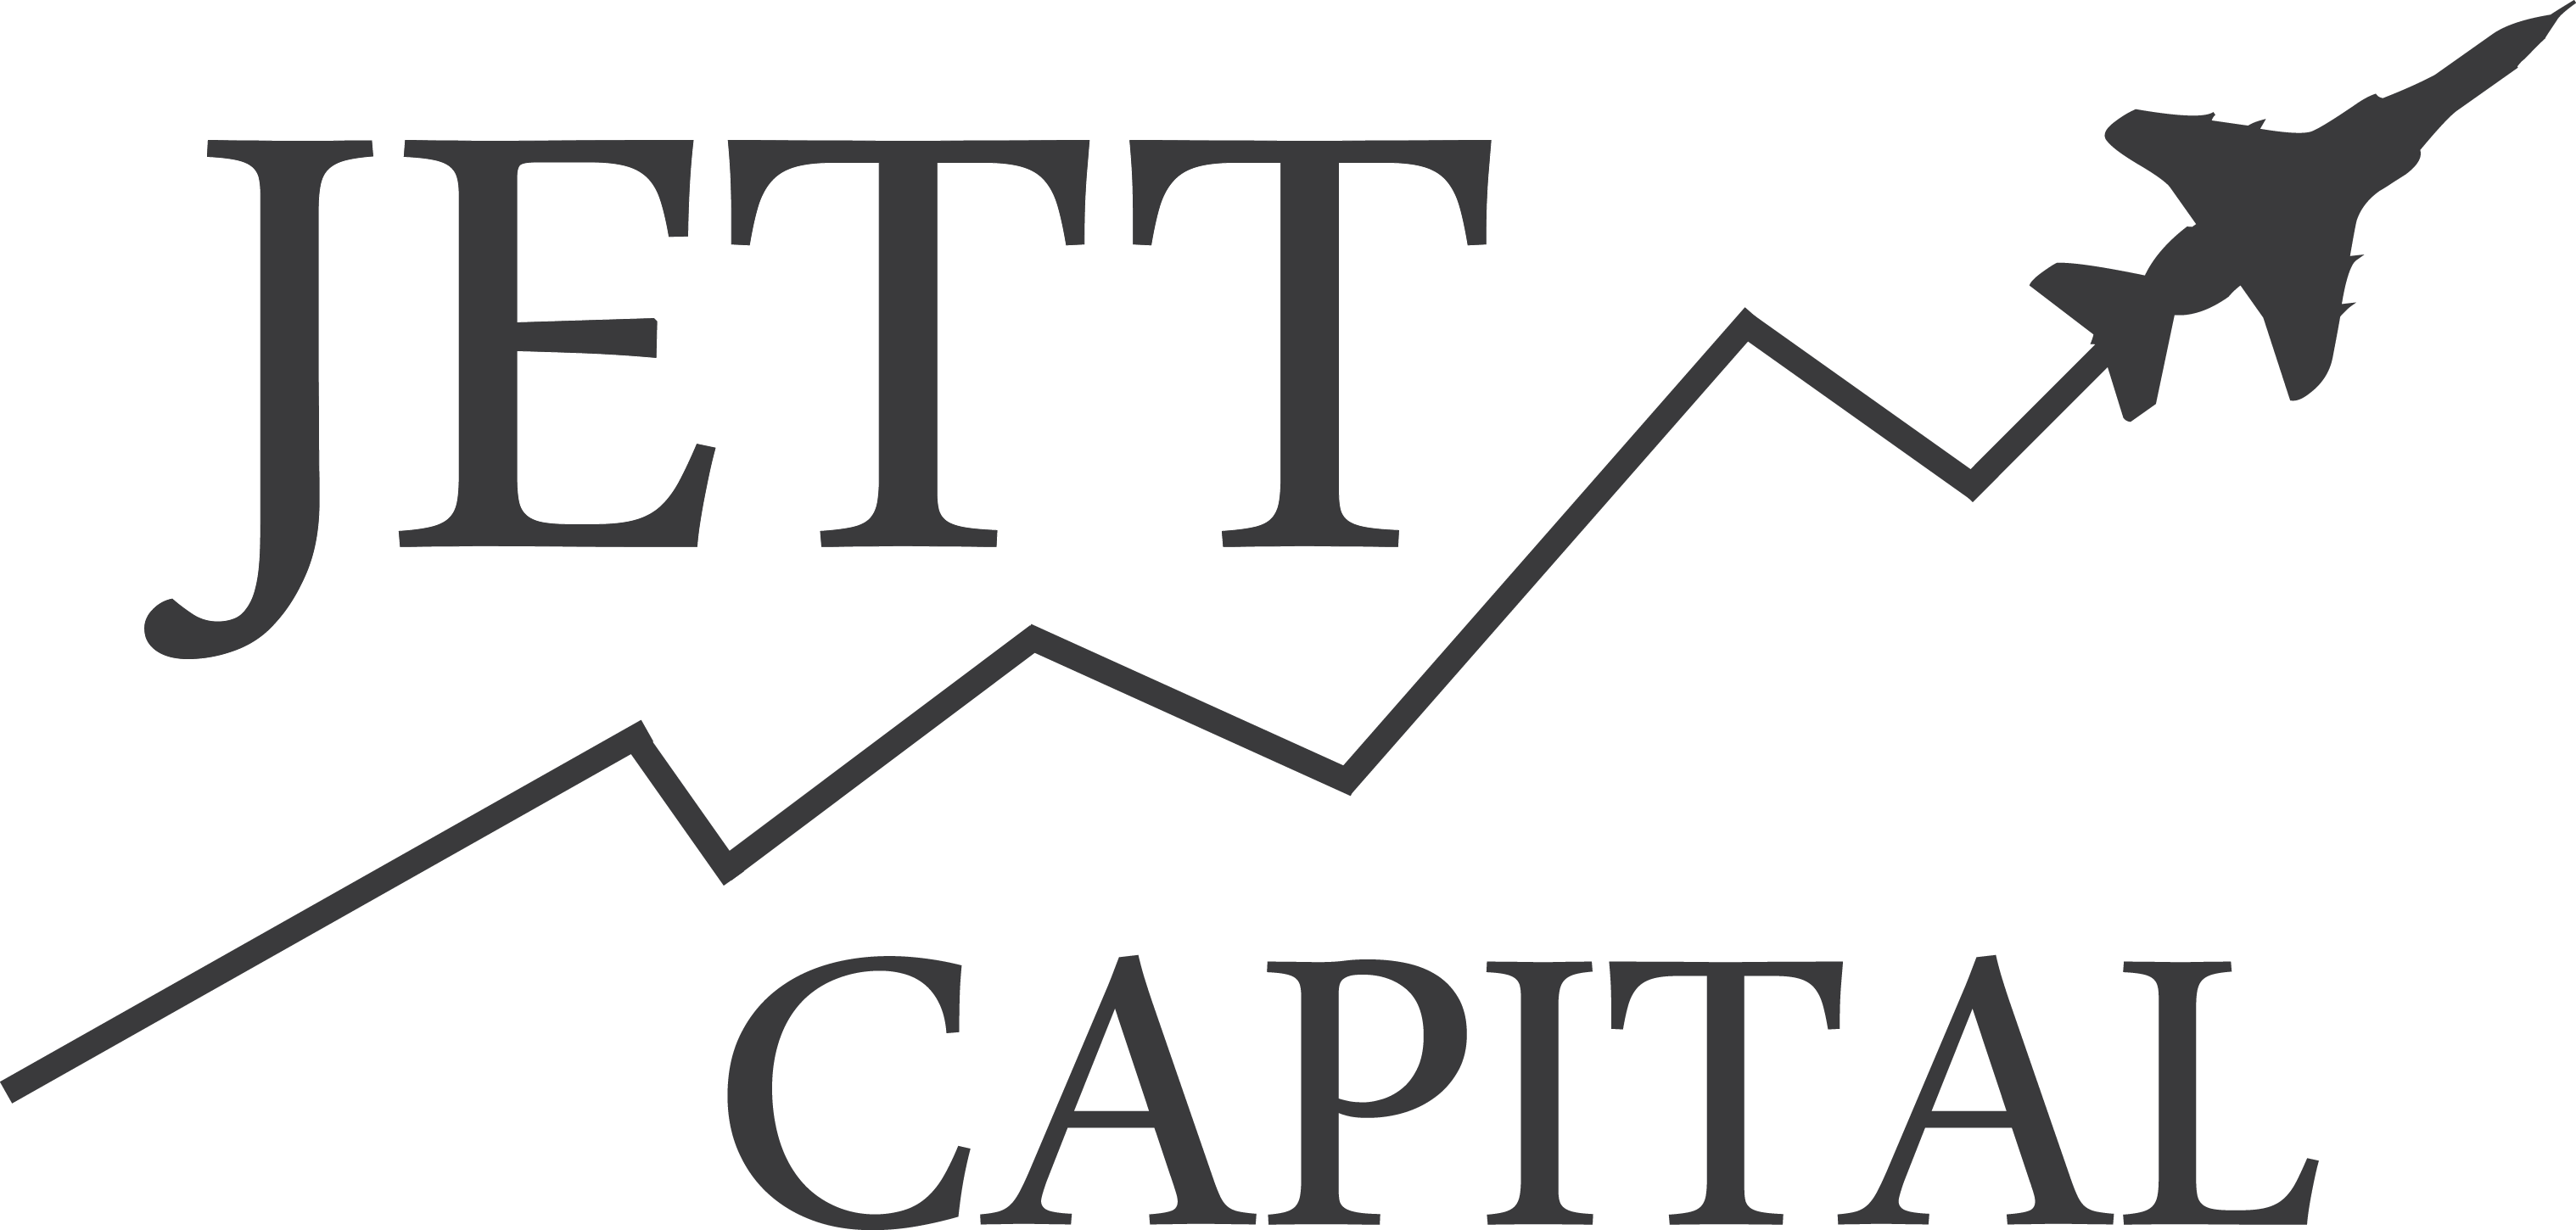 Jett Capital Management